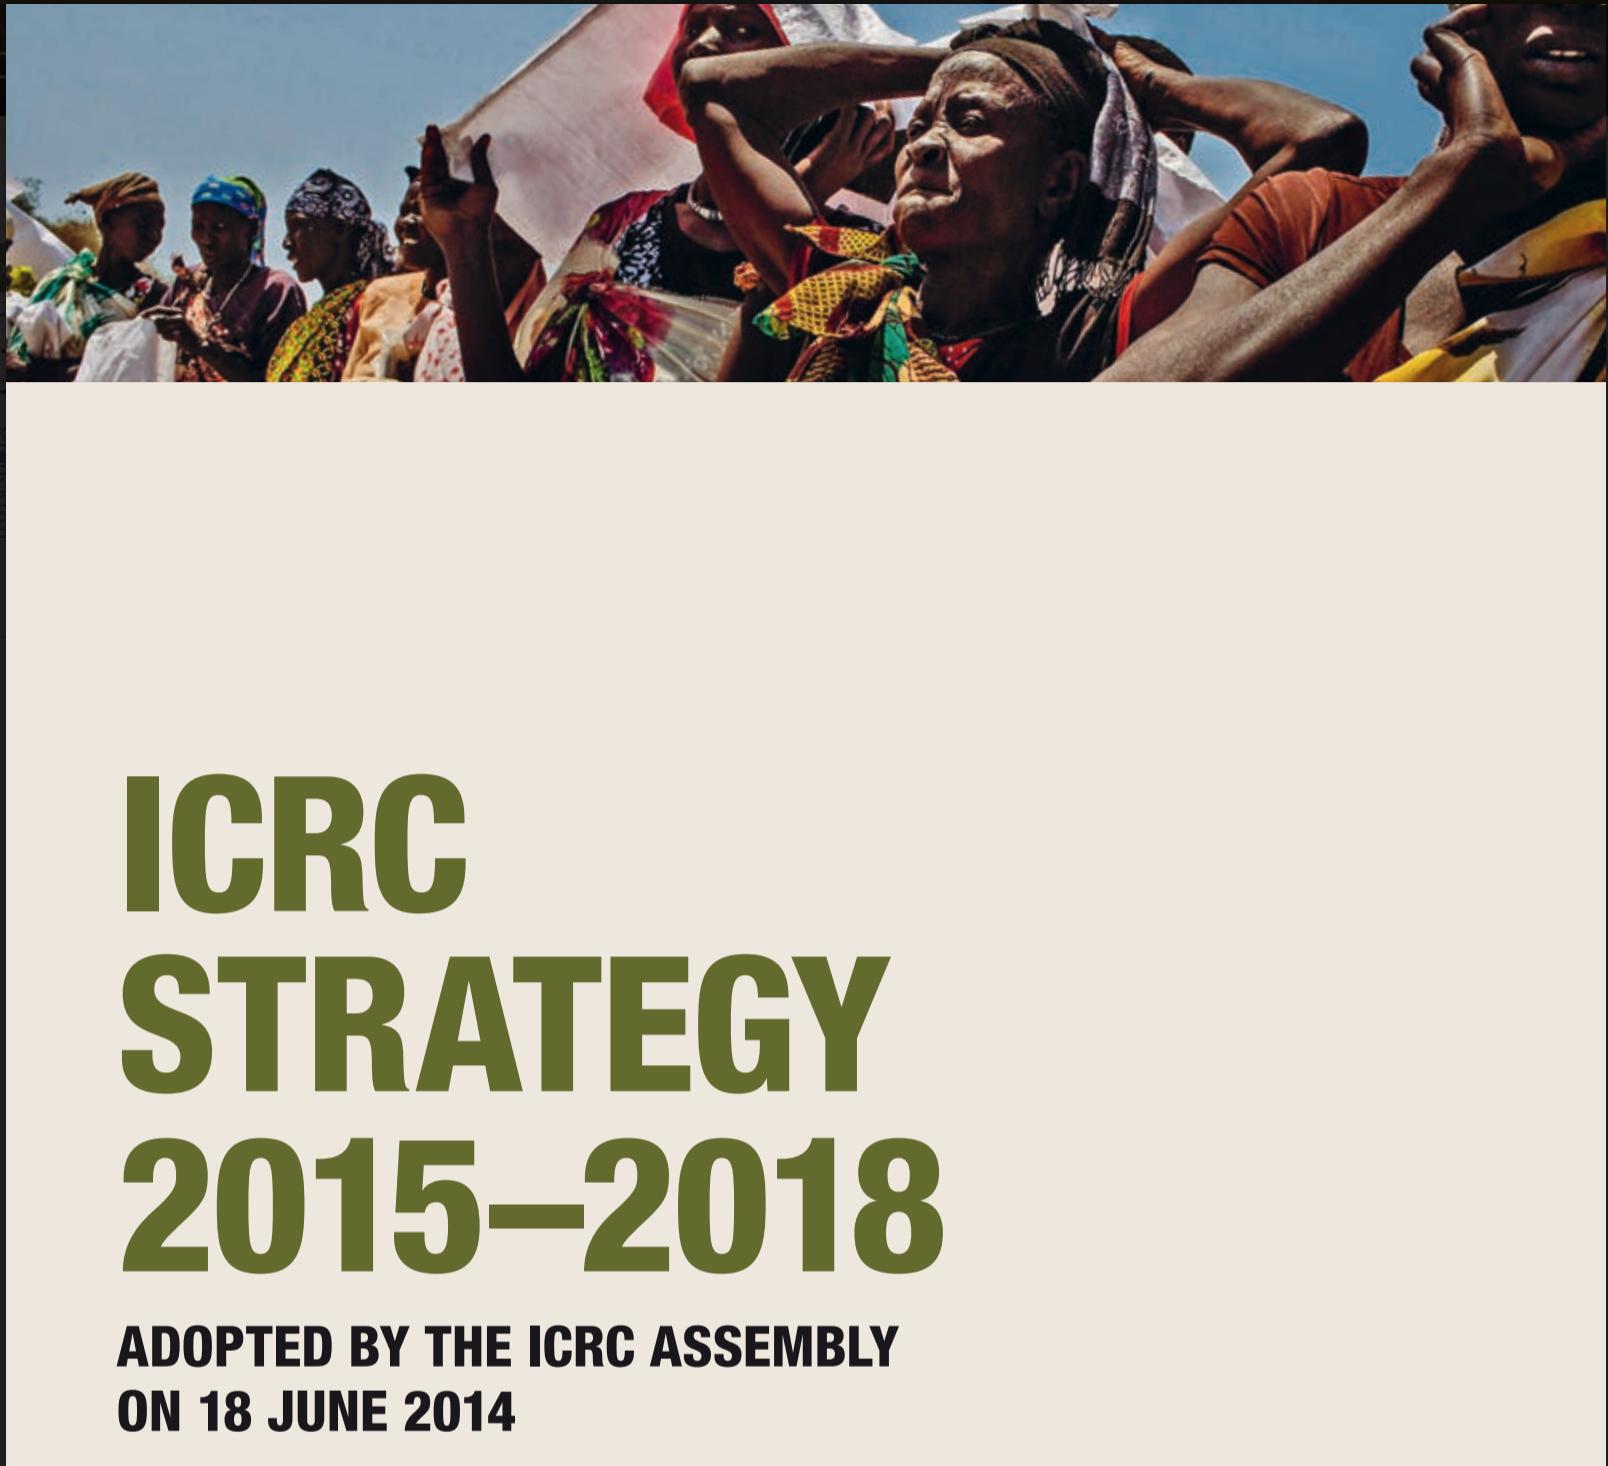 ICRCstrategy15-18